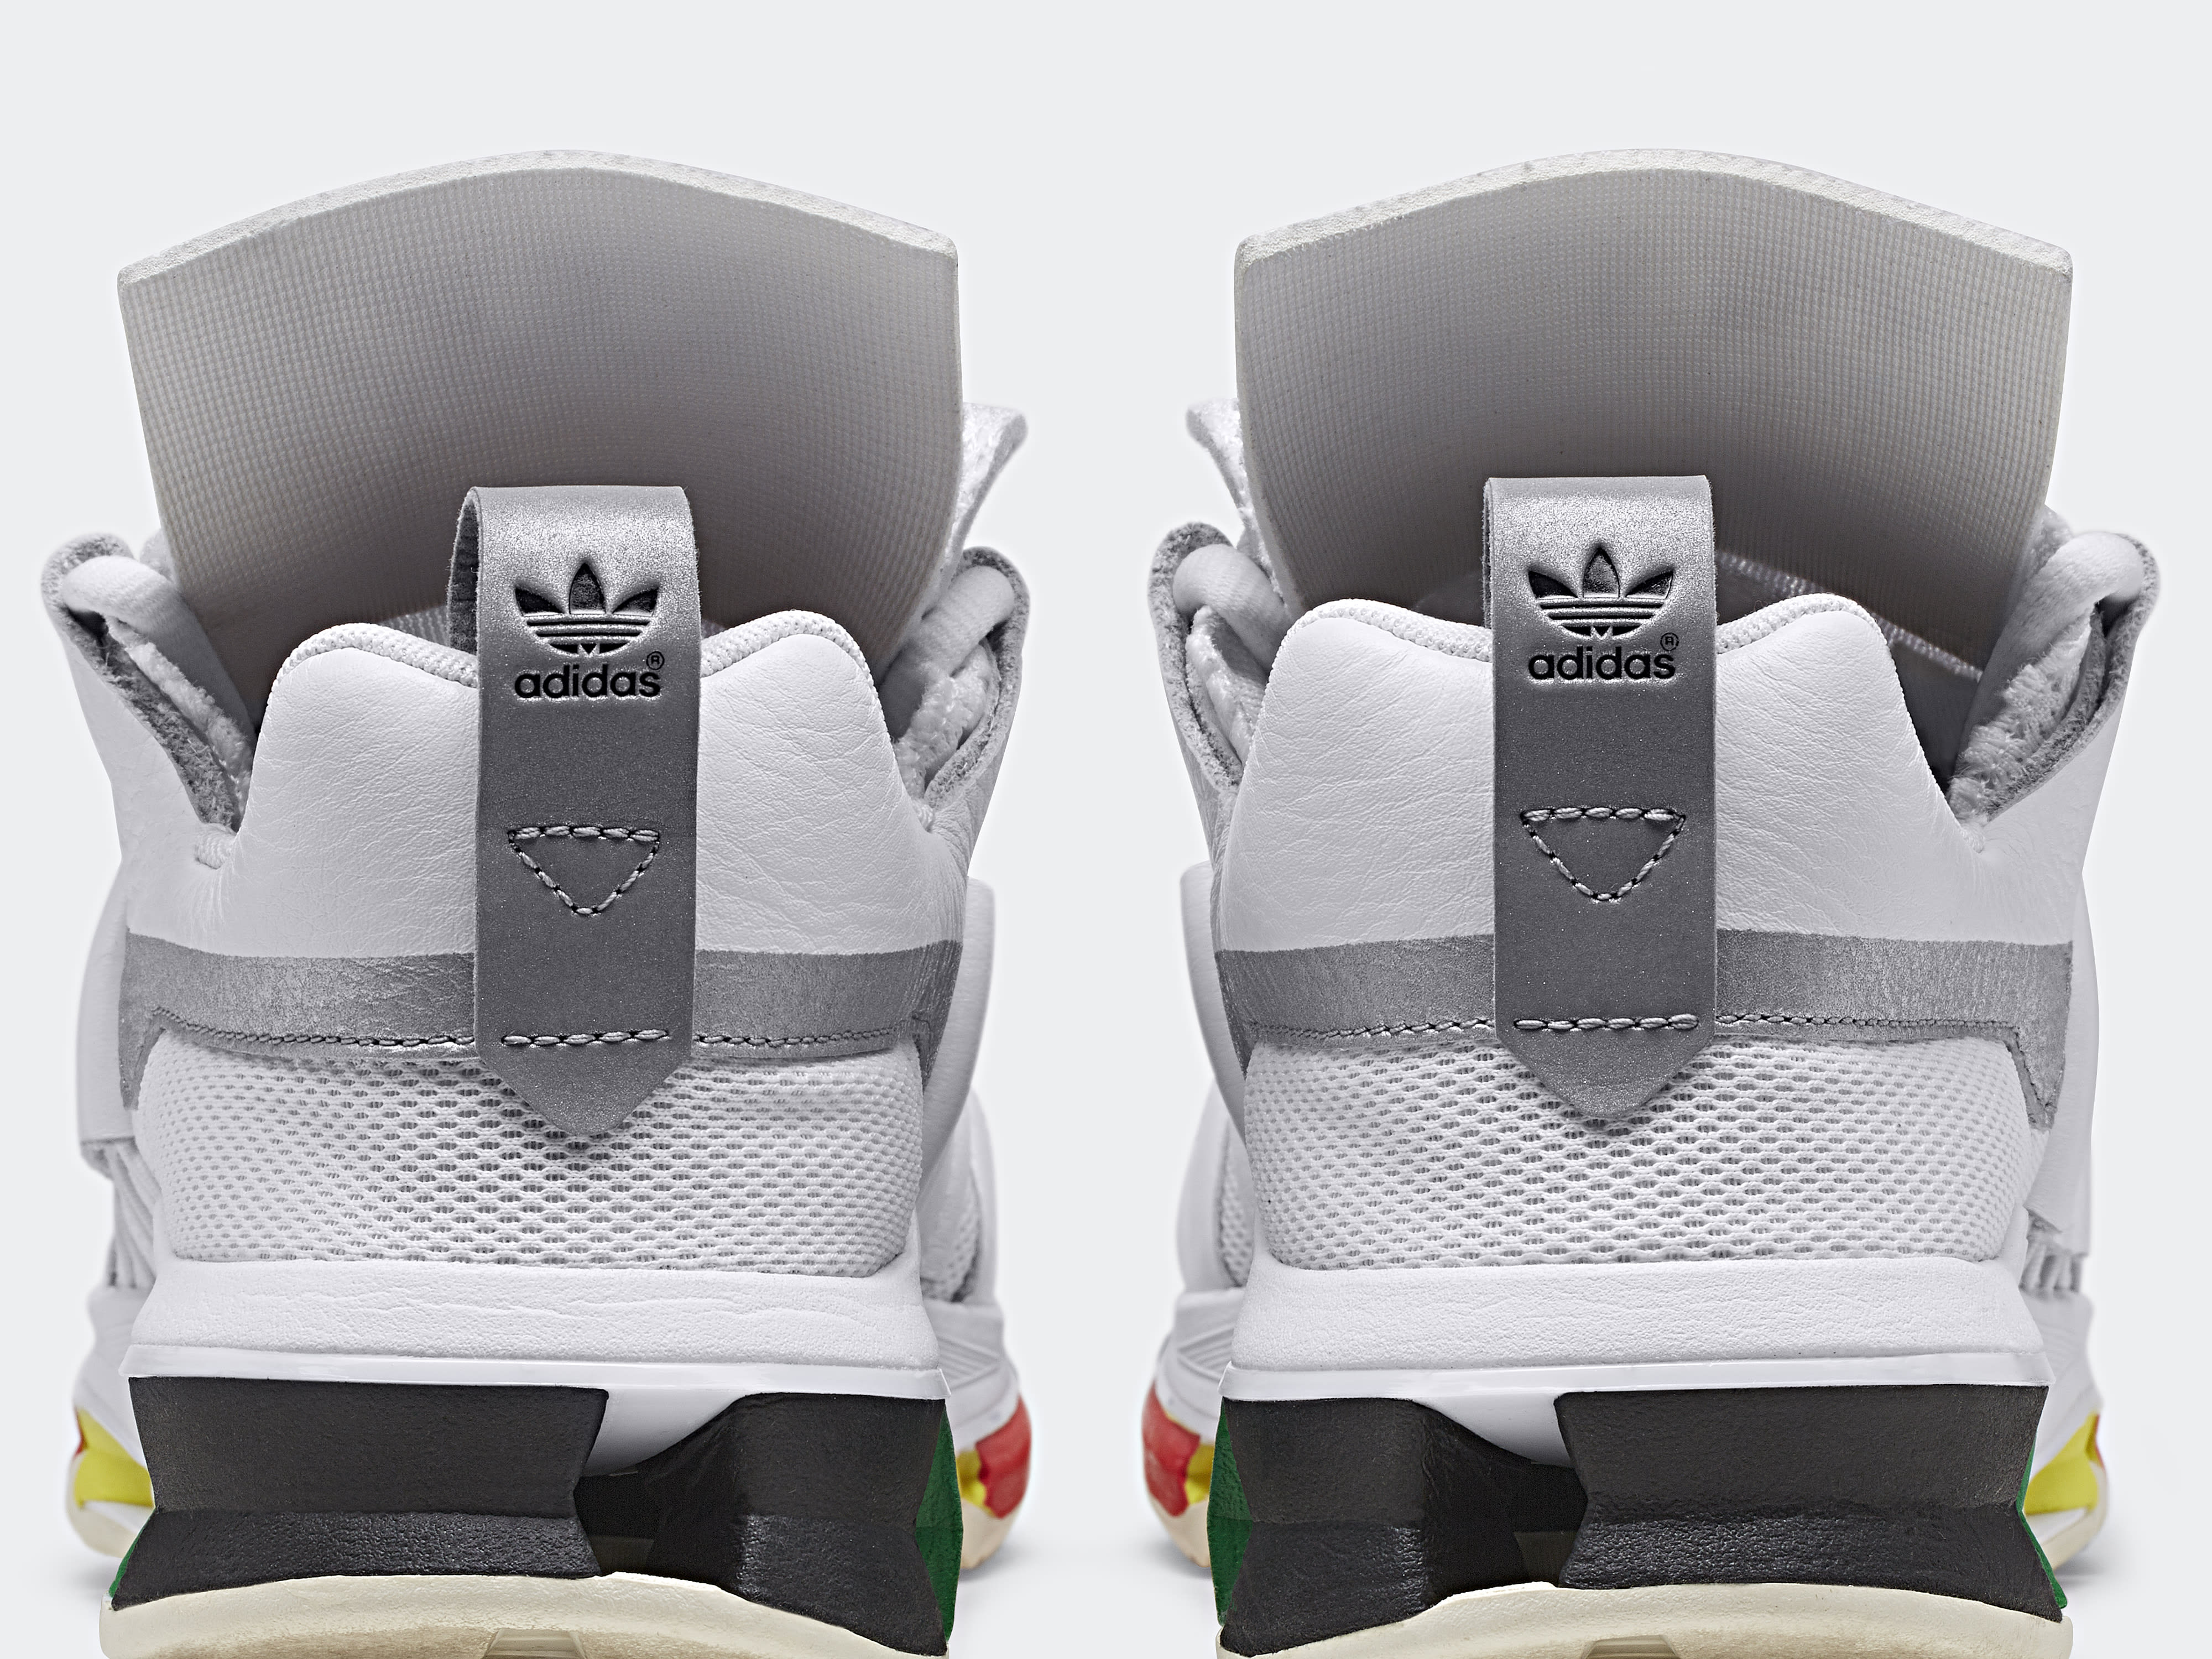 Oyster Holdings x Adidas Twinstrike ADV BD7262 (Heel)